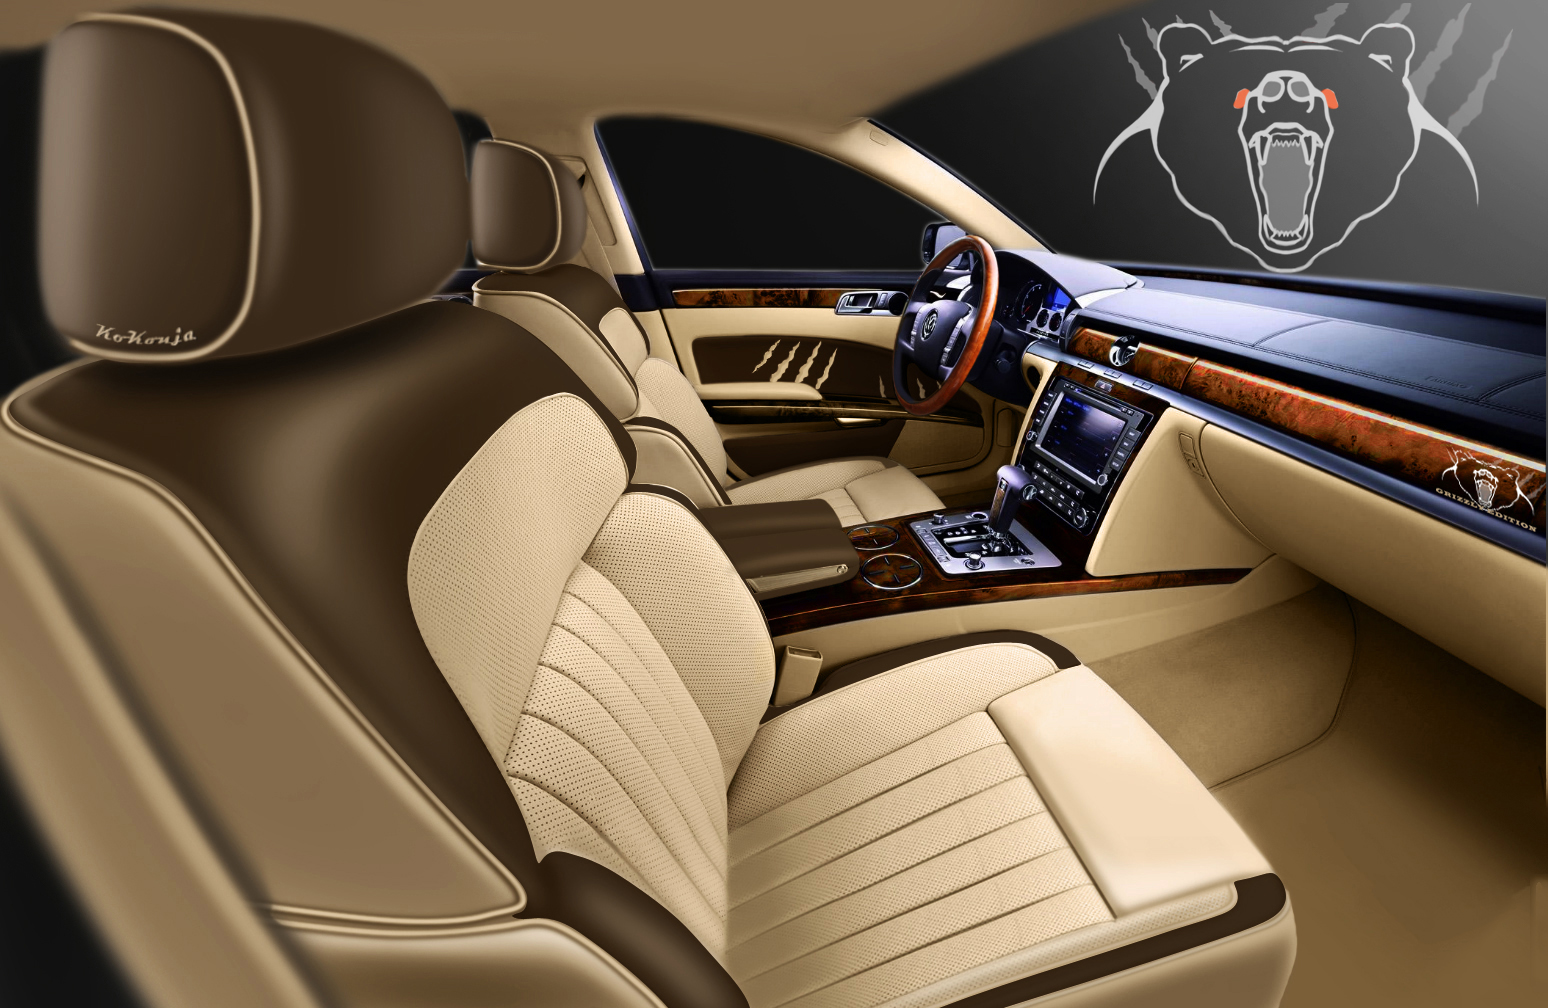 Classic Interior Vw Phaeton Jaguar Mk1 Dm Classic Cars